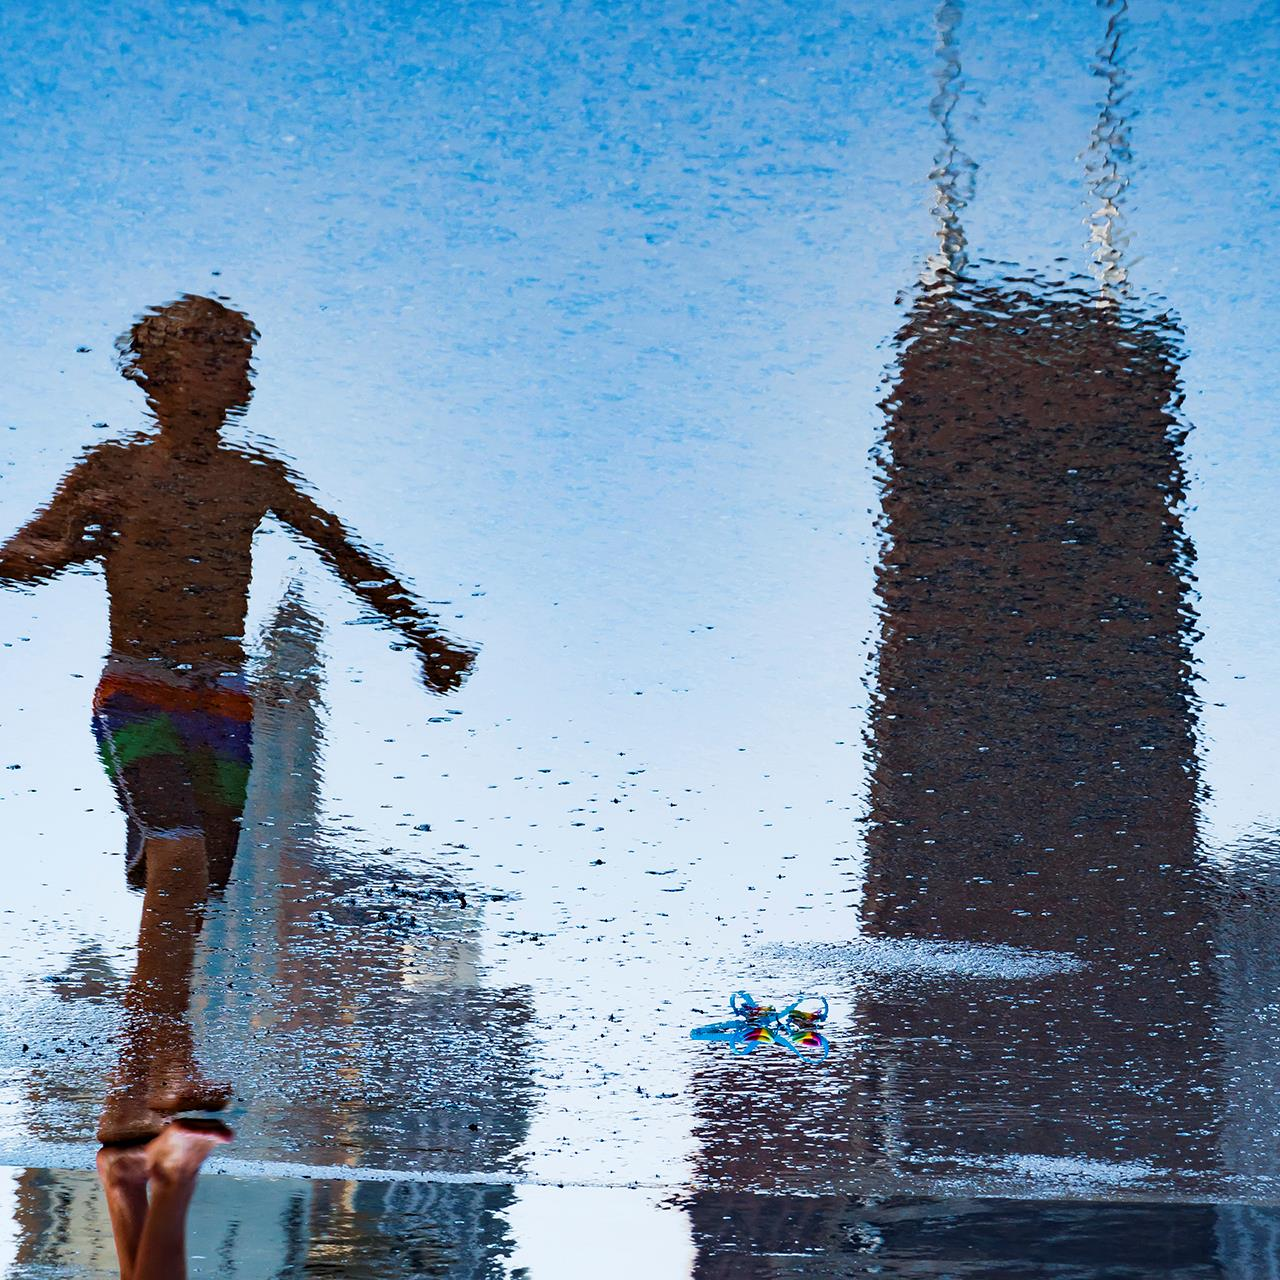 Город Брызг, Натали Вебер / Natalie Weber, Гленвью, Иллинойс, Фотоконкурс Santa Fe Photographic